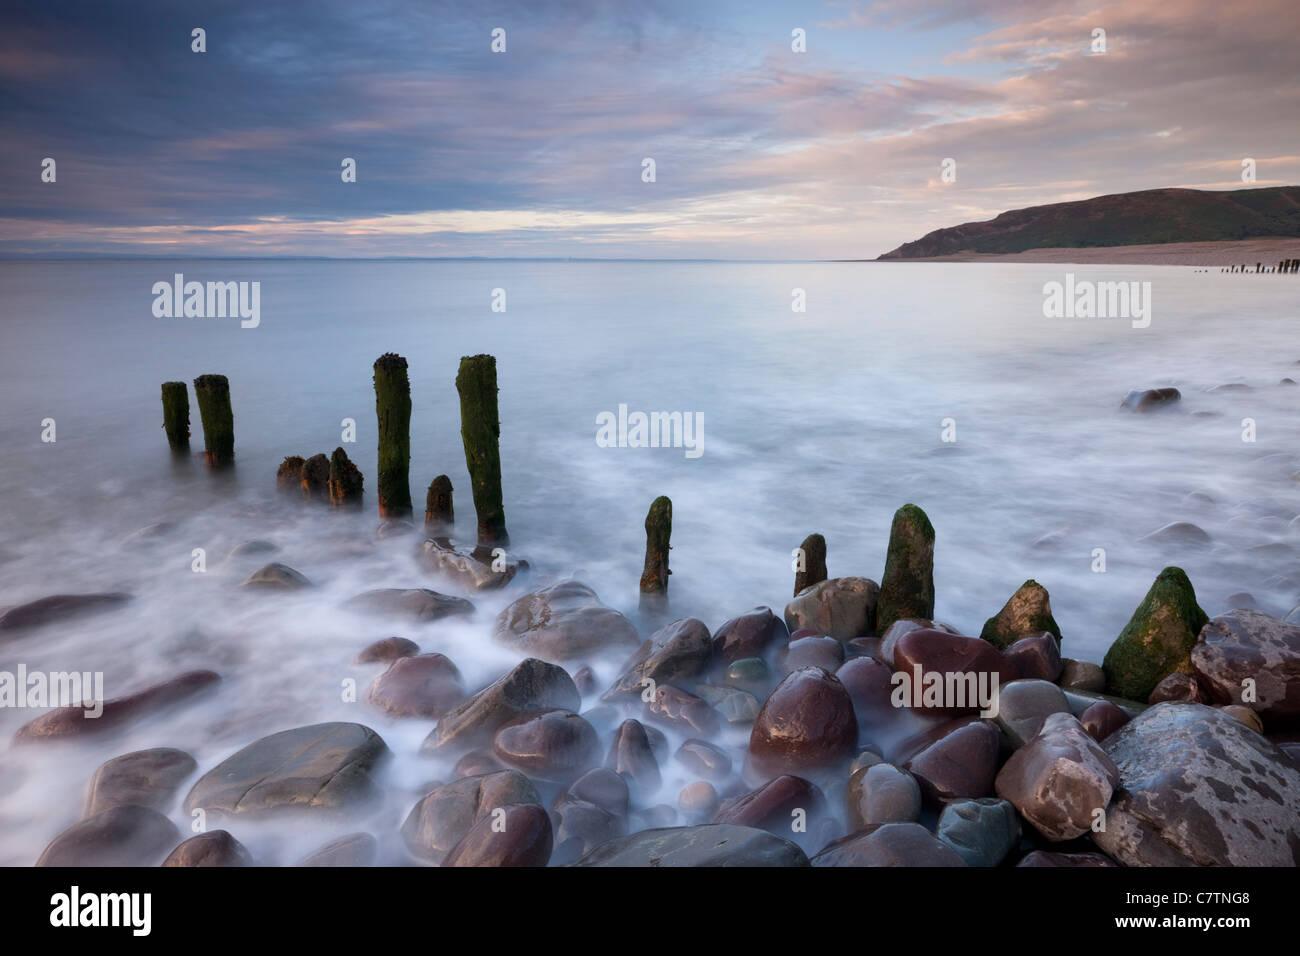 Wooden groyne on Porlock Beach, Exmoor, Somerset, England. Summer (August) 2011. - Stock Image